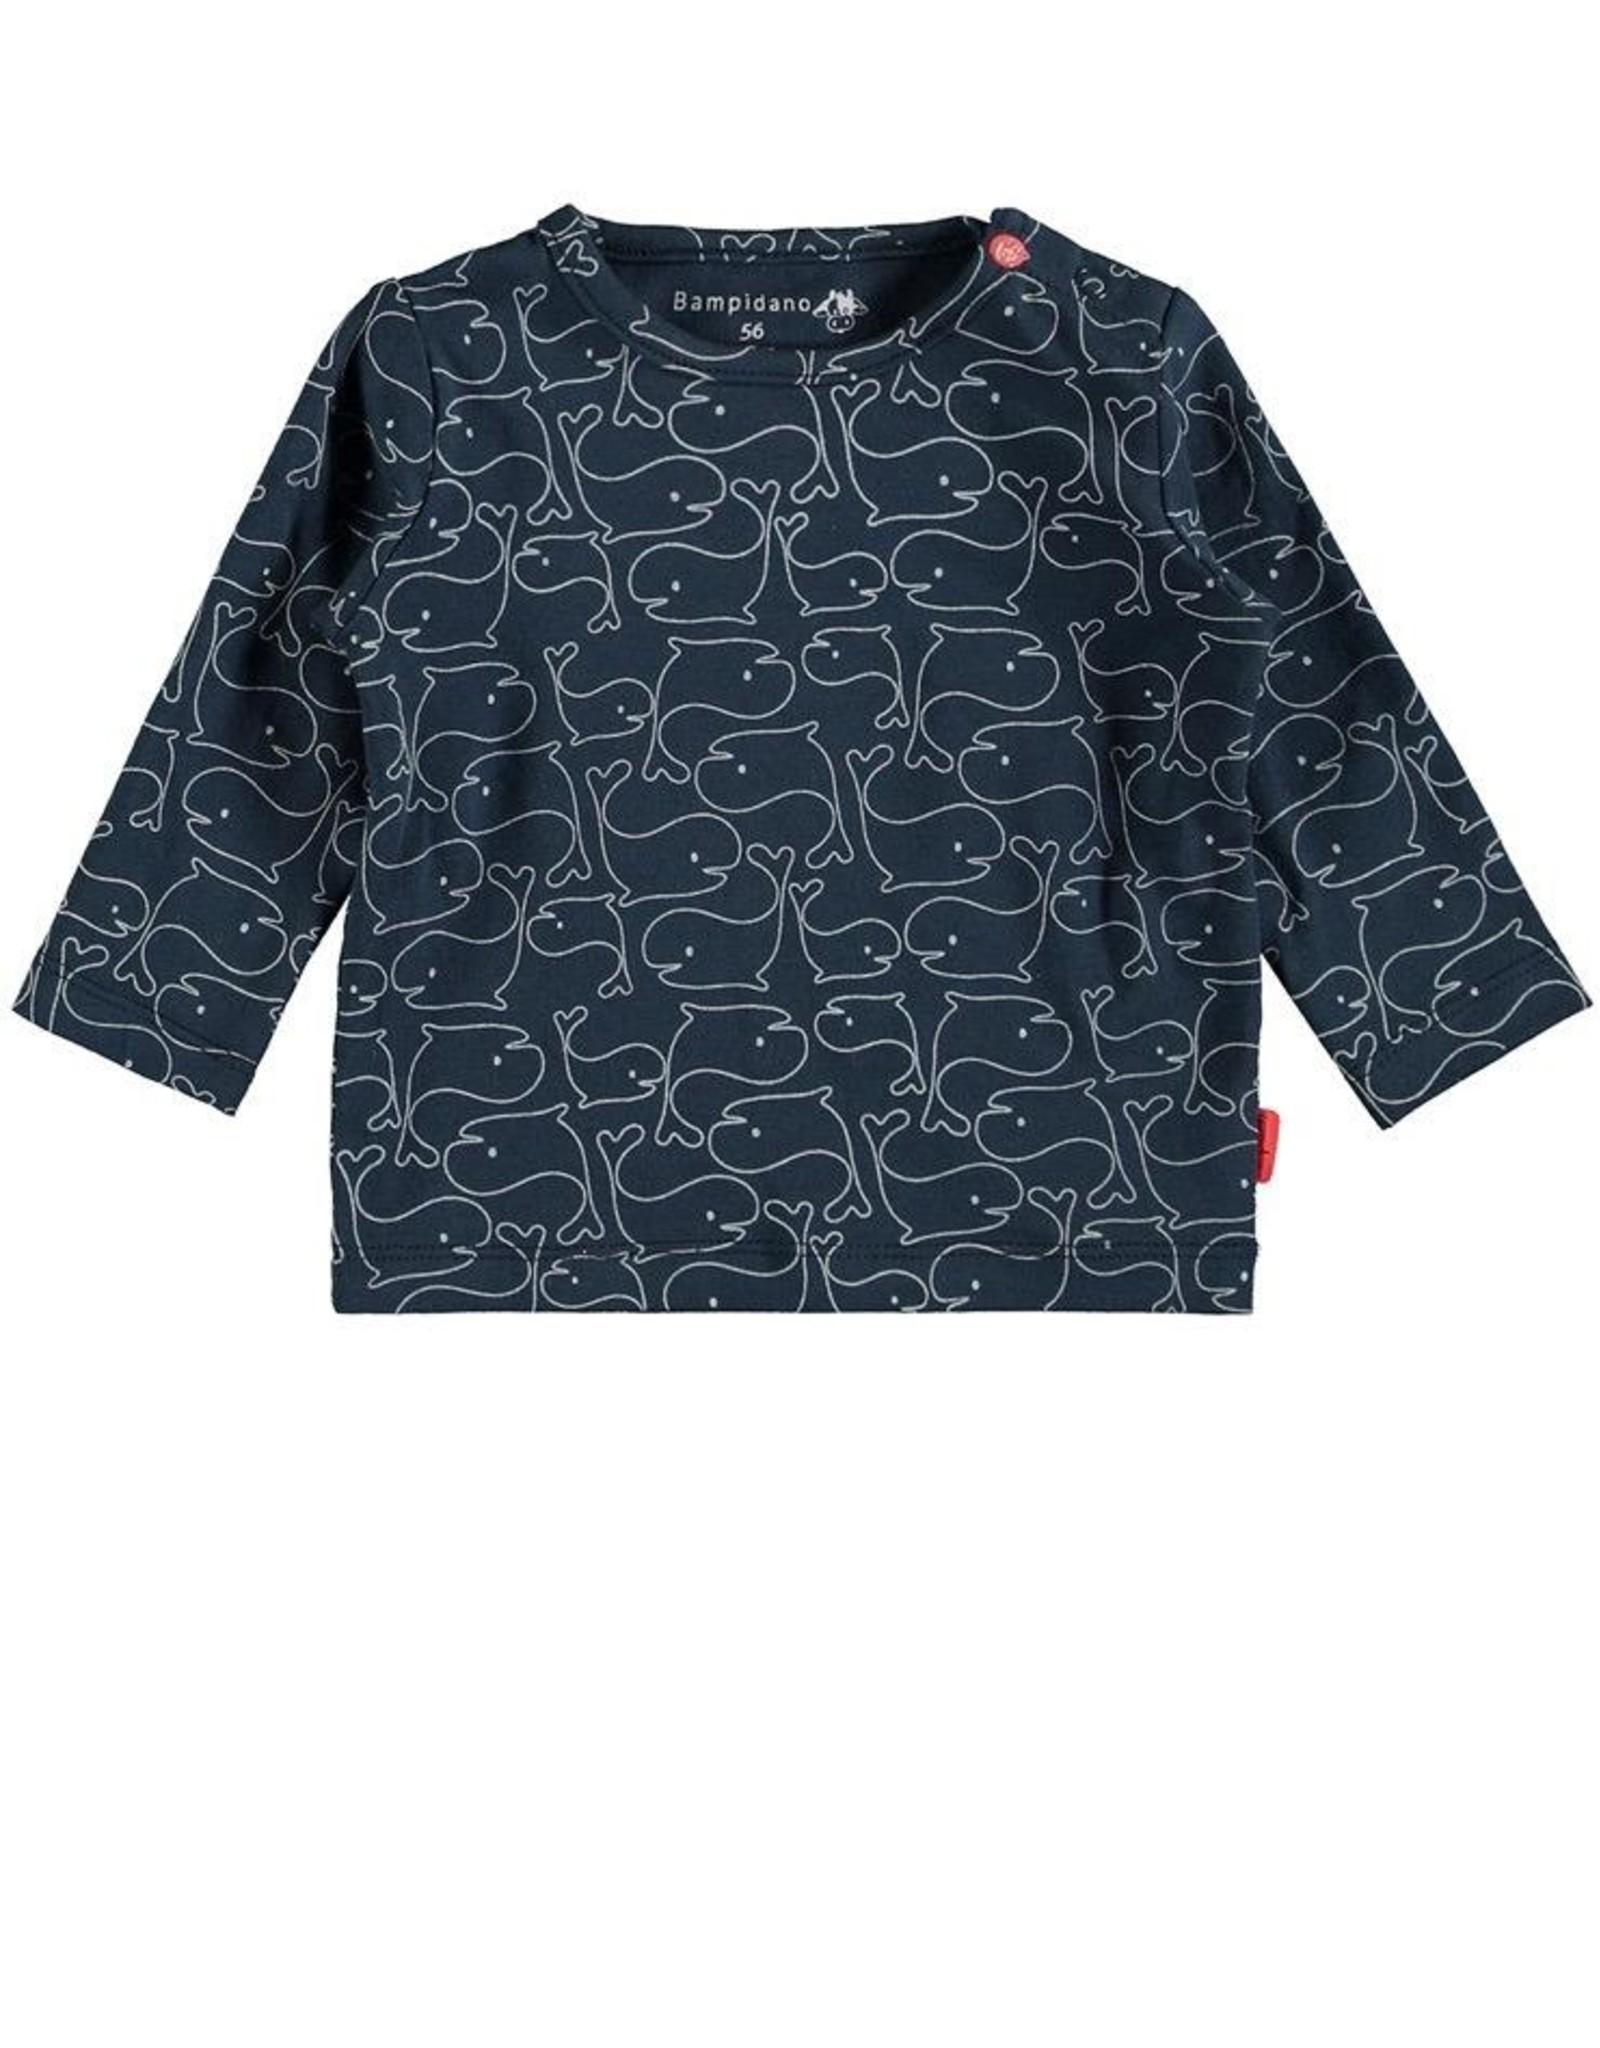 Bampidano Whale Print Long Sleeve Danique Top